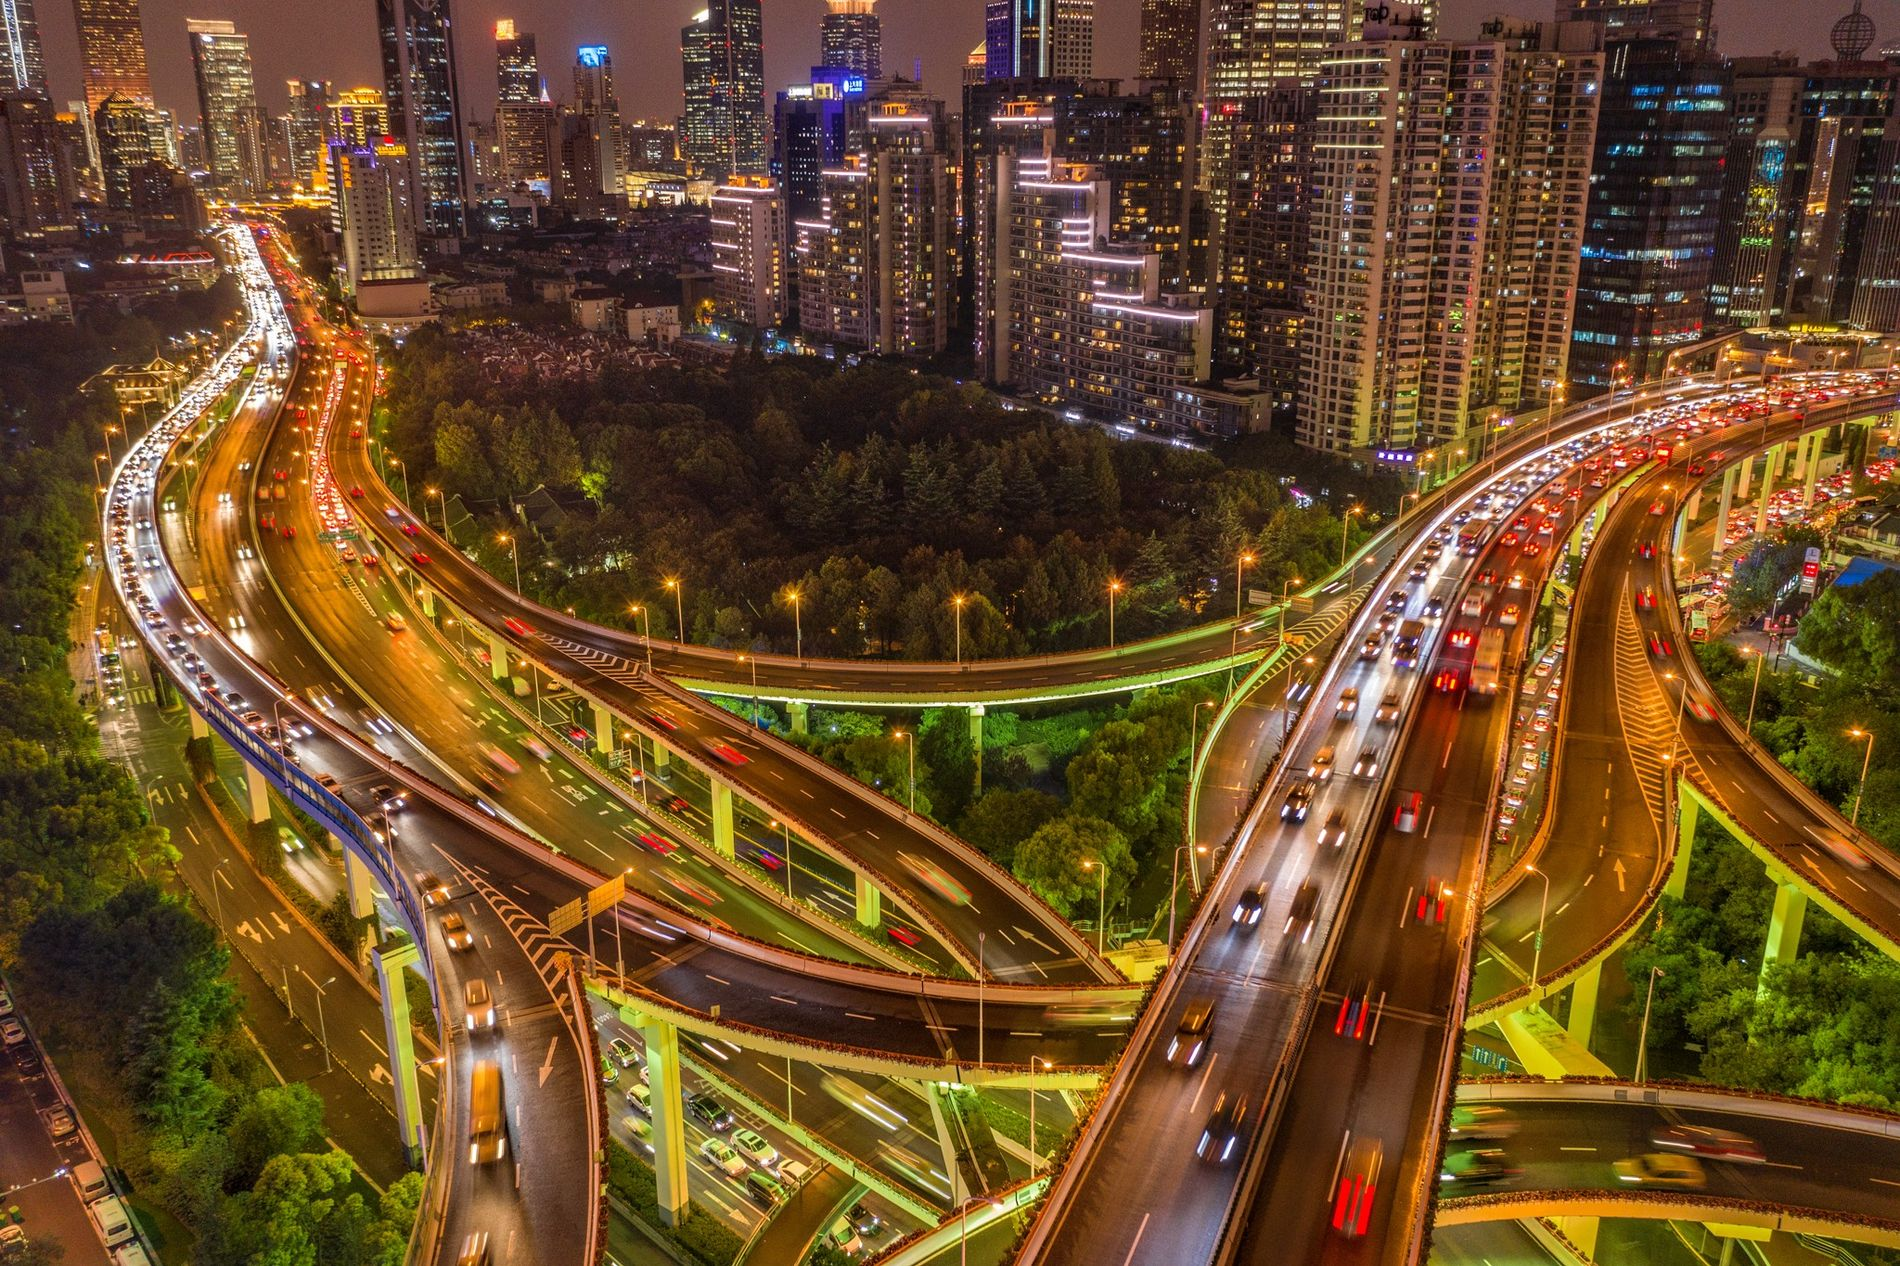 Para construir as cidades do futuro, temos que sair dos nossos carros